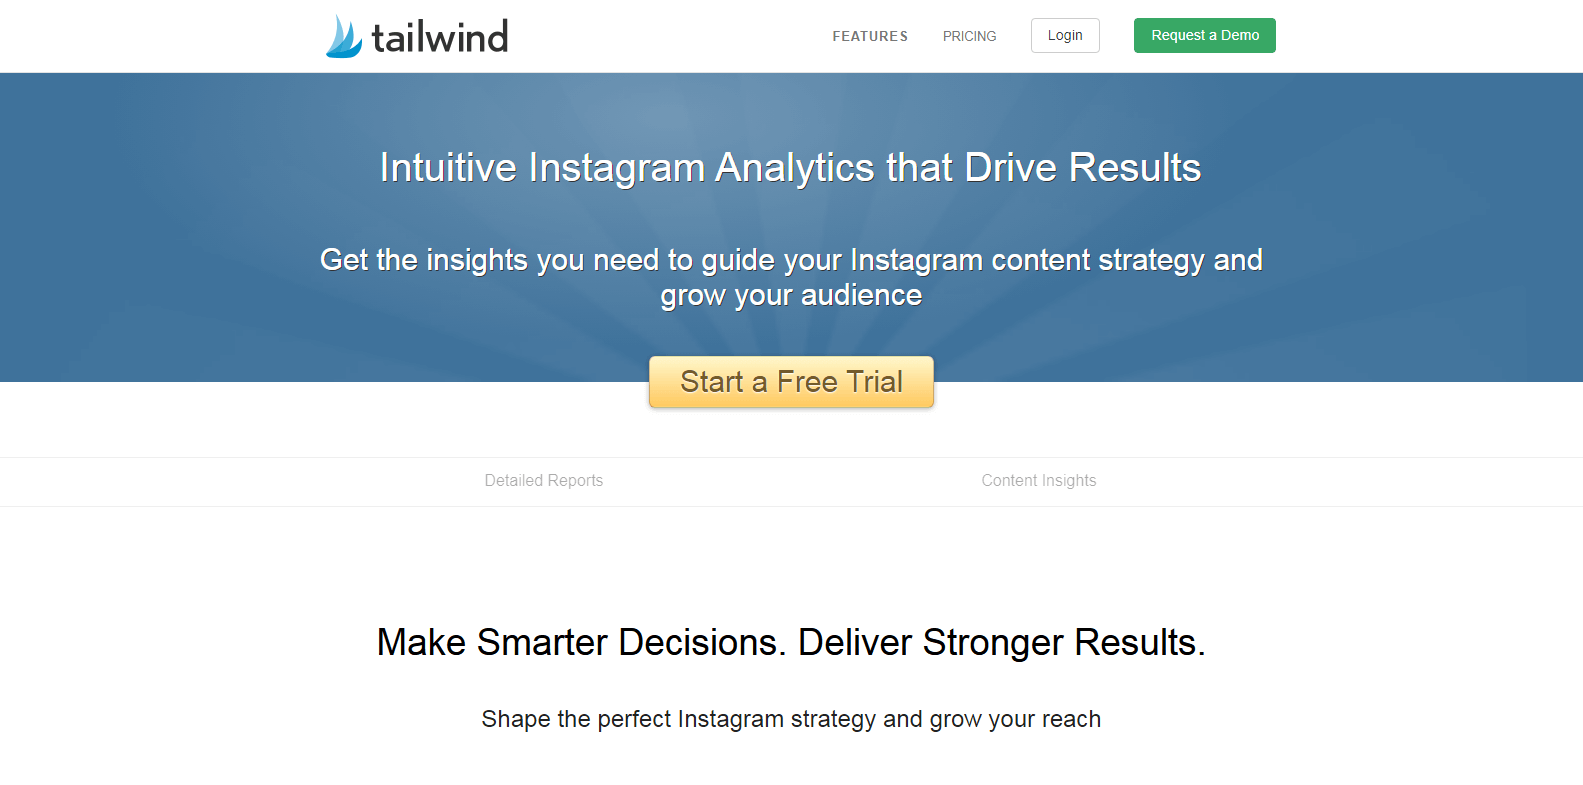 Tailwind Instagram Analytics Tools